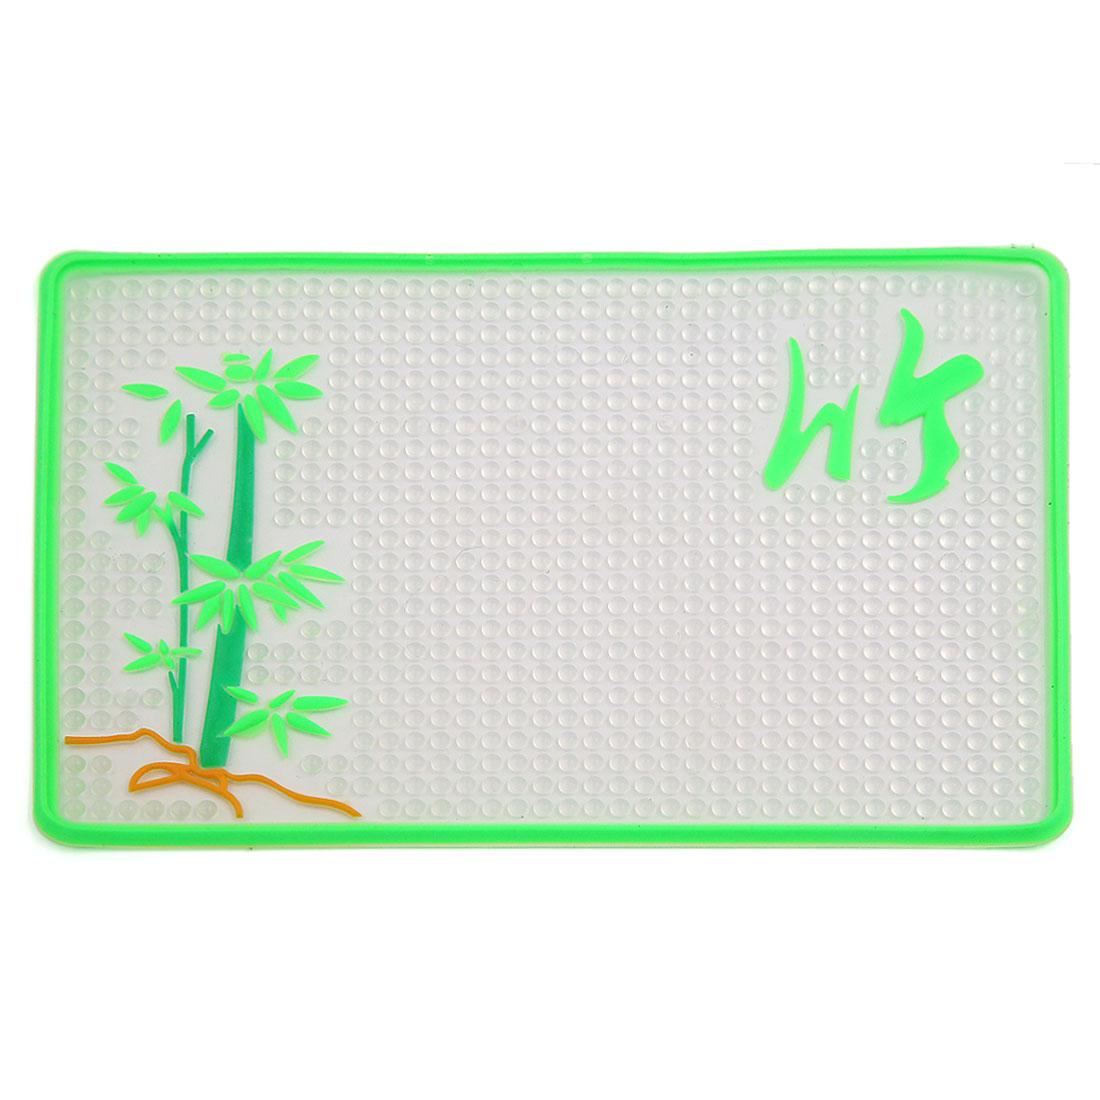 Green Bamboo Pattern Car Magic Anti-Slip Dashboard Sticky Pad Non-slip Mat GPS Phone Holder 20cm x 13cm